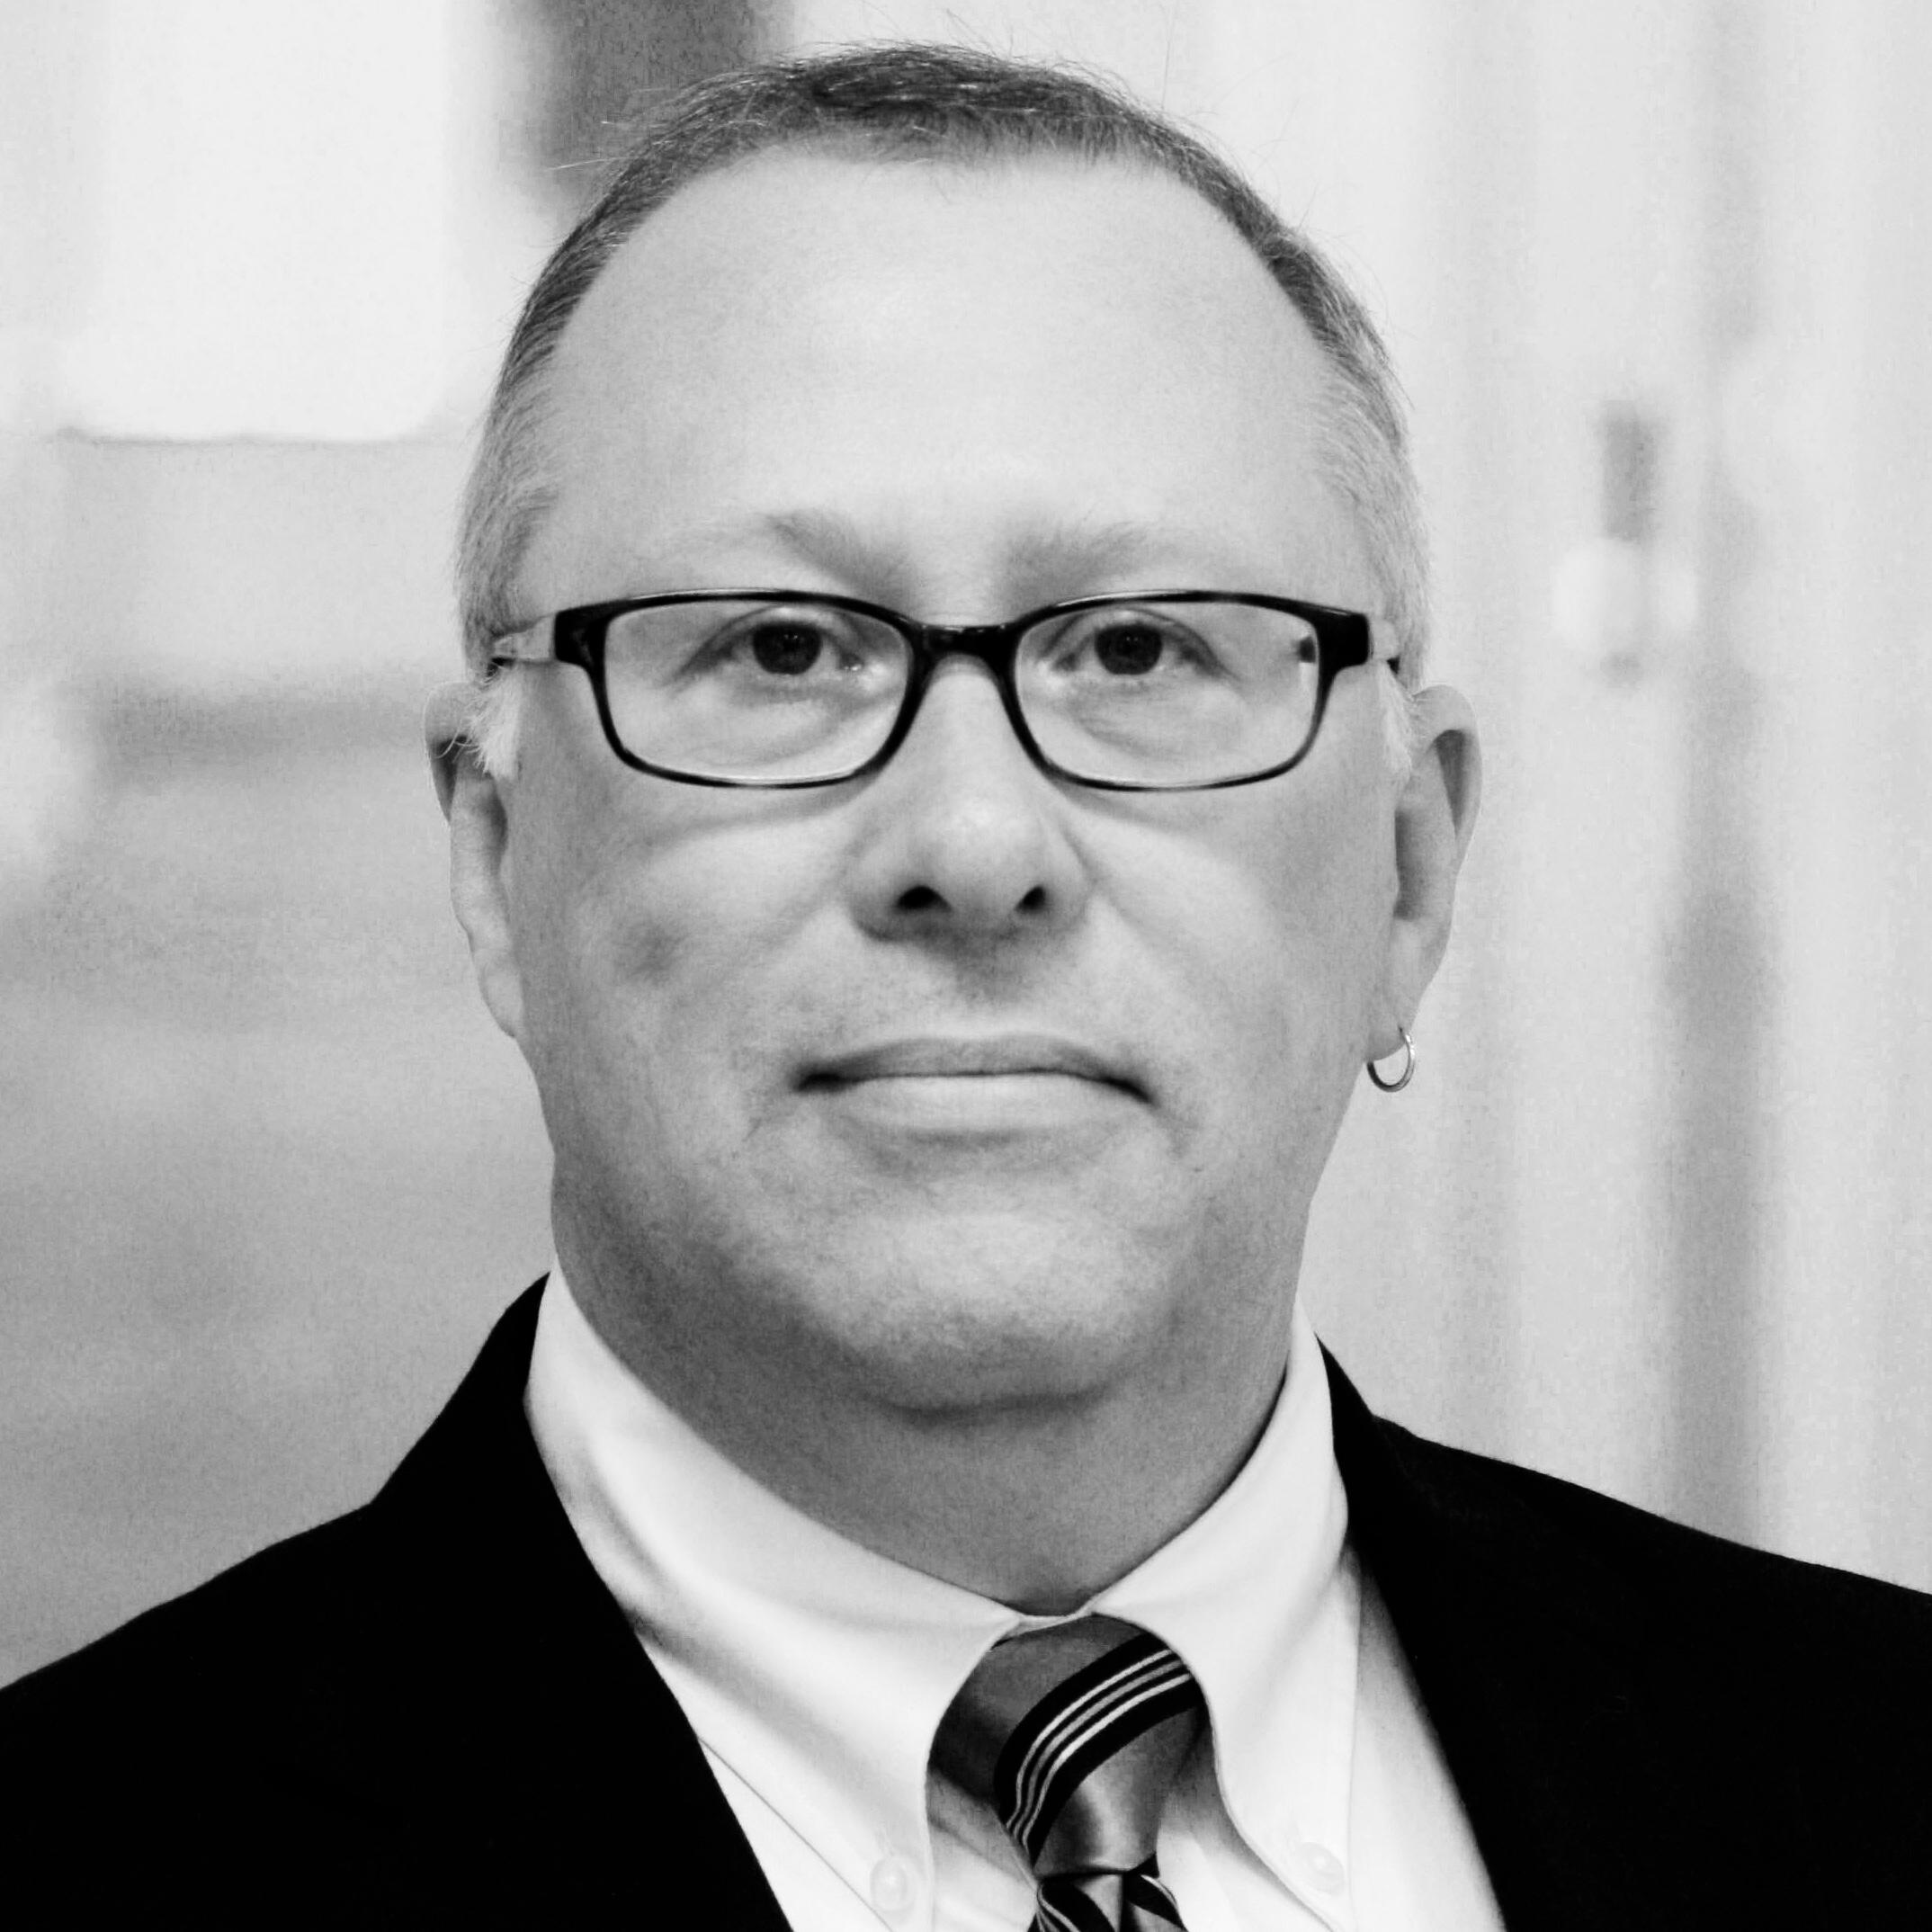 James Quick, Director, Solutions & Advisory